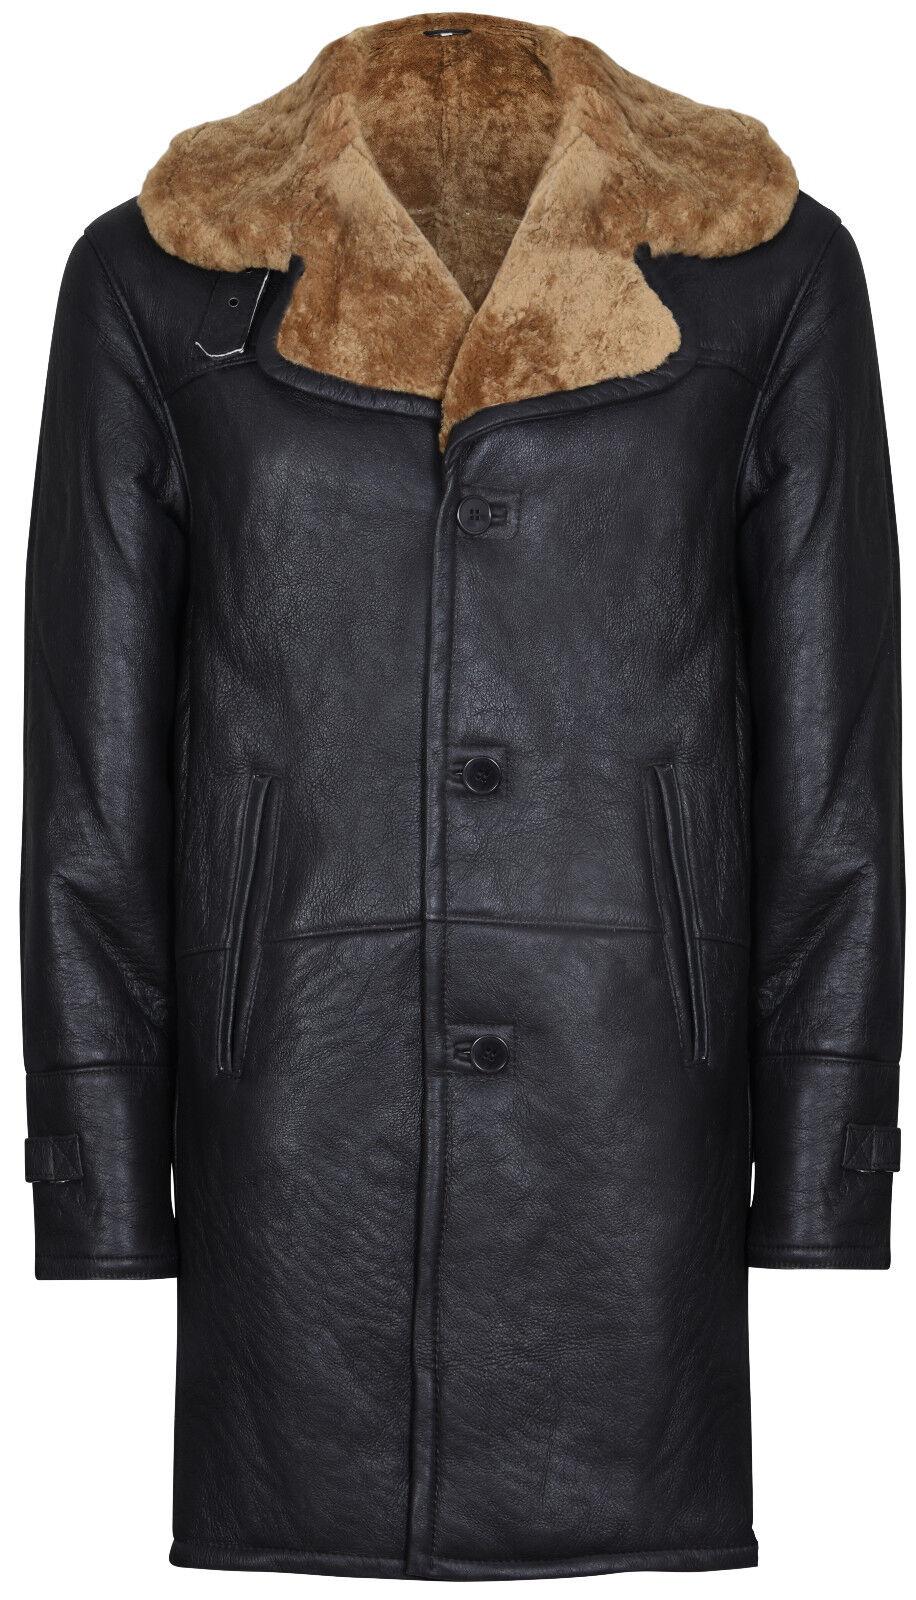 Men's Warm Braun Long Real Shearling Ginger Sheepskin Leder Cromby Pilot Coat